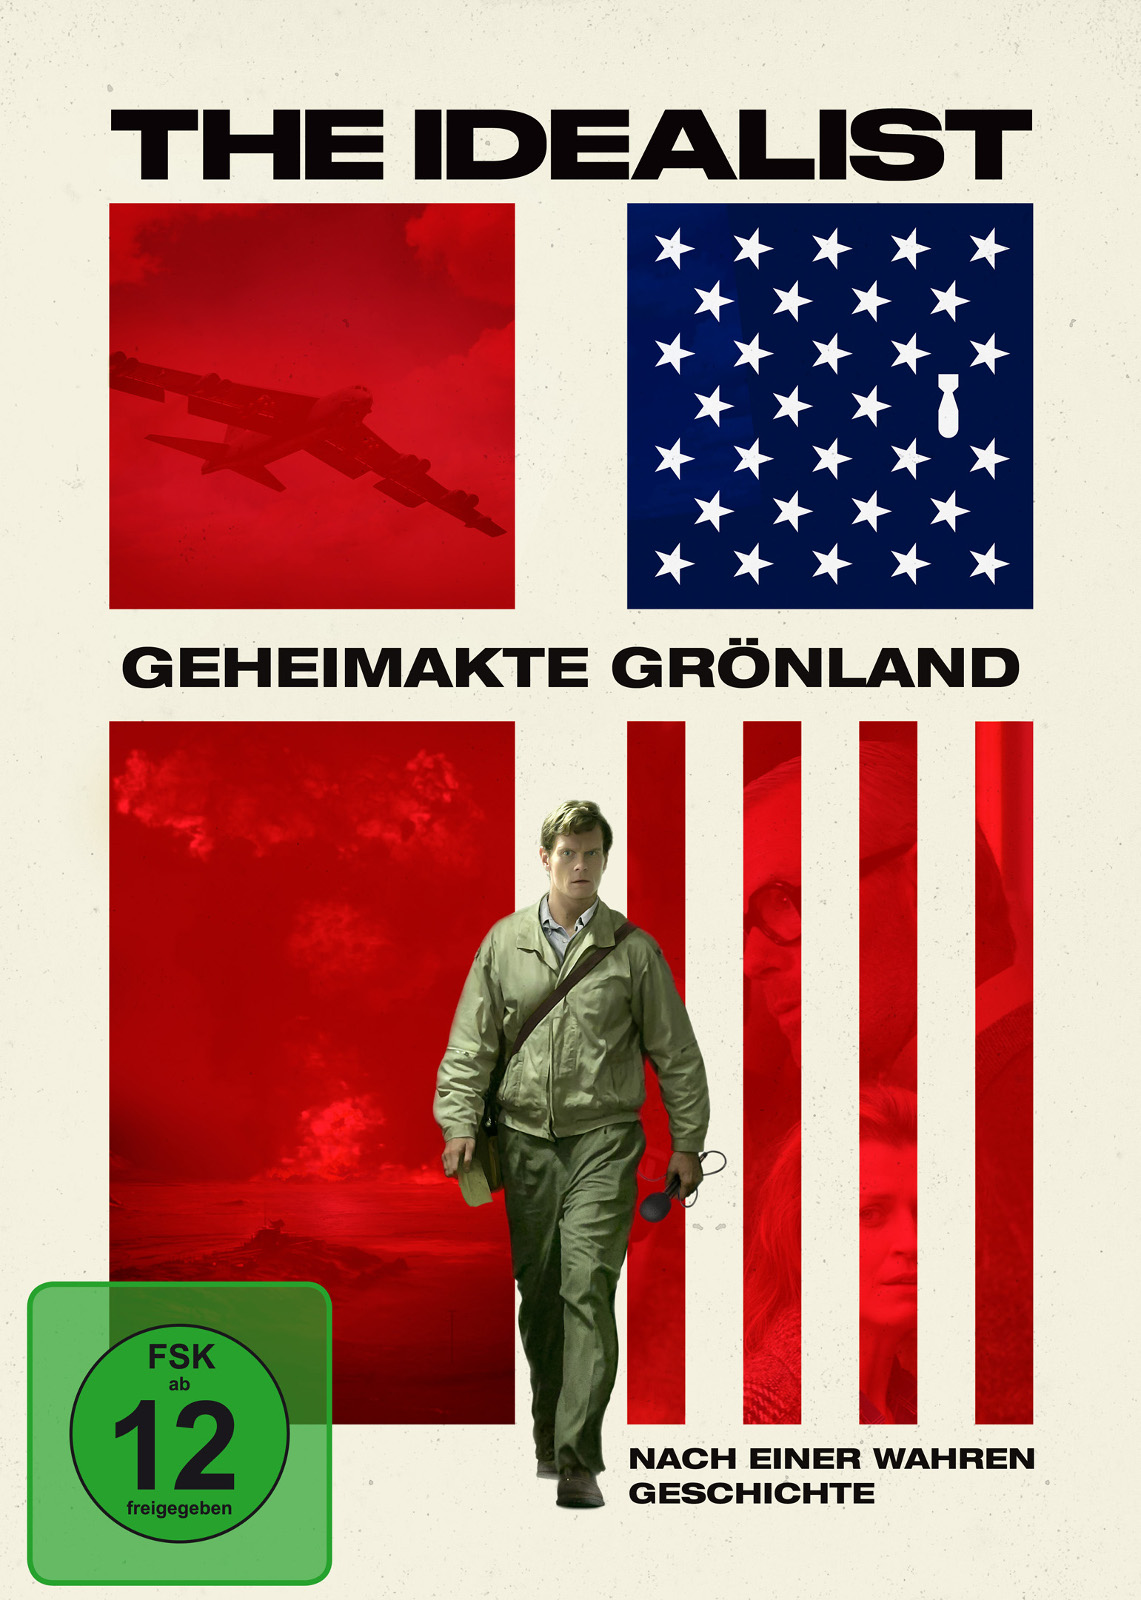 the idealist geheimakte groenland